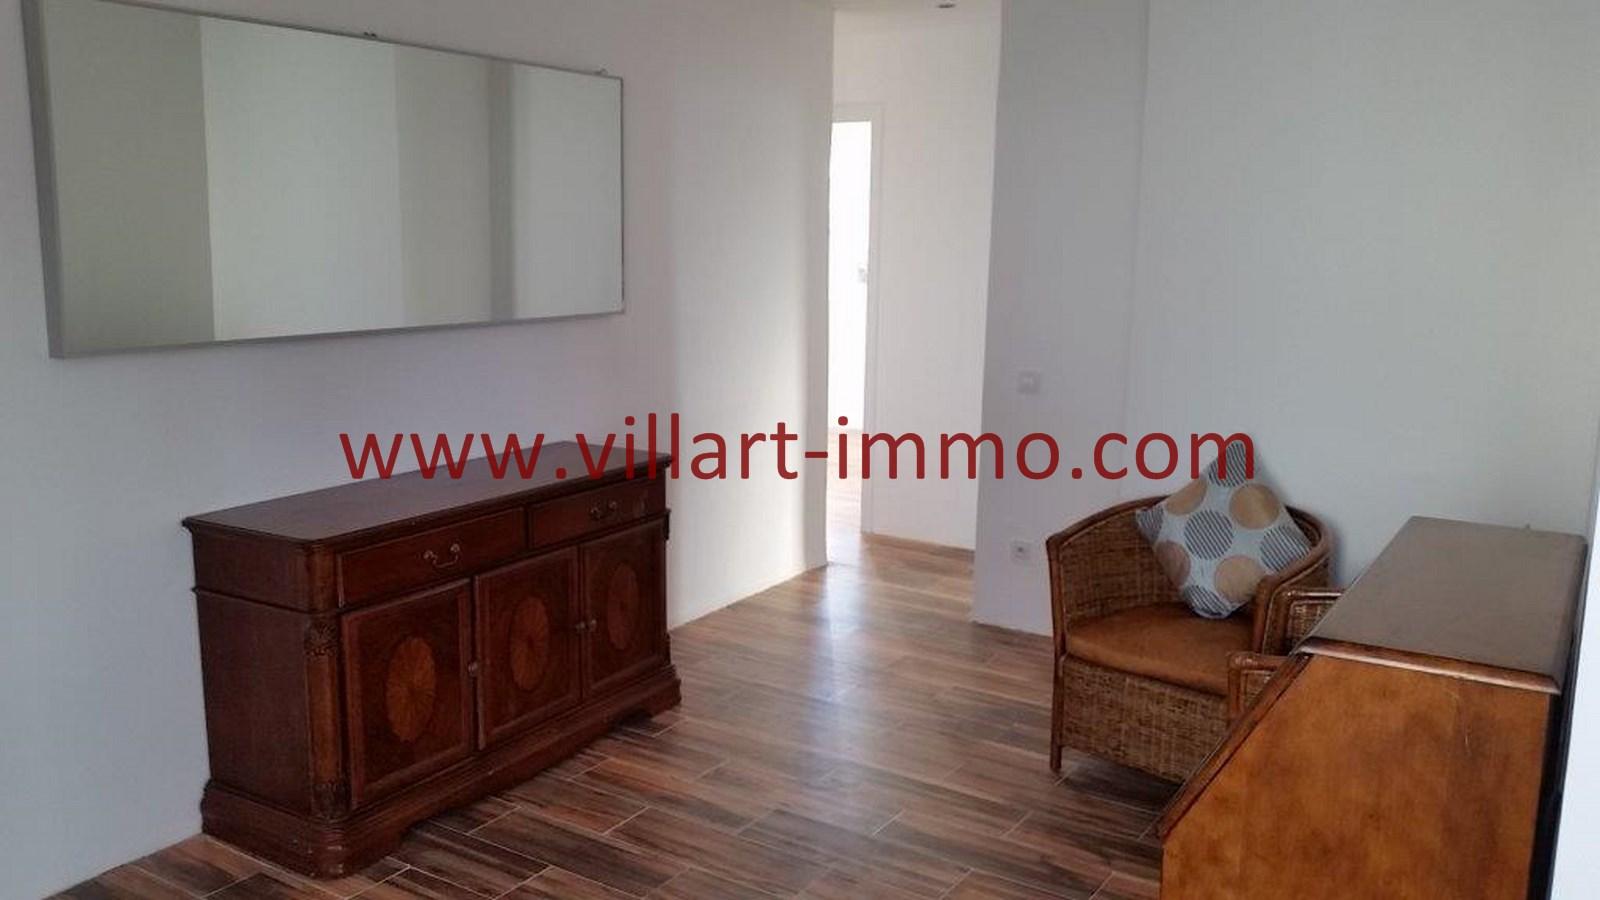 9-Vente-Appartement-Tanger-Centre-De-Ville-Chambre 1-VA518-Villart Immo